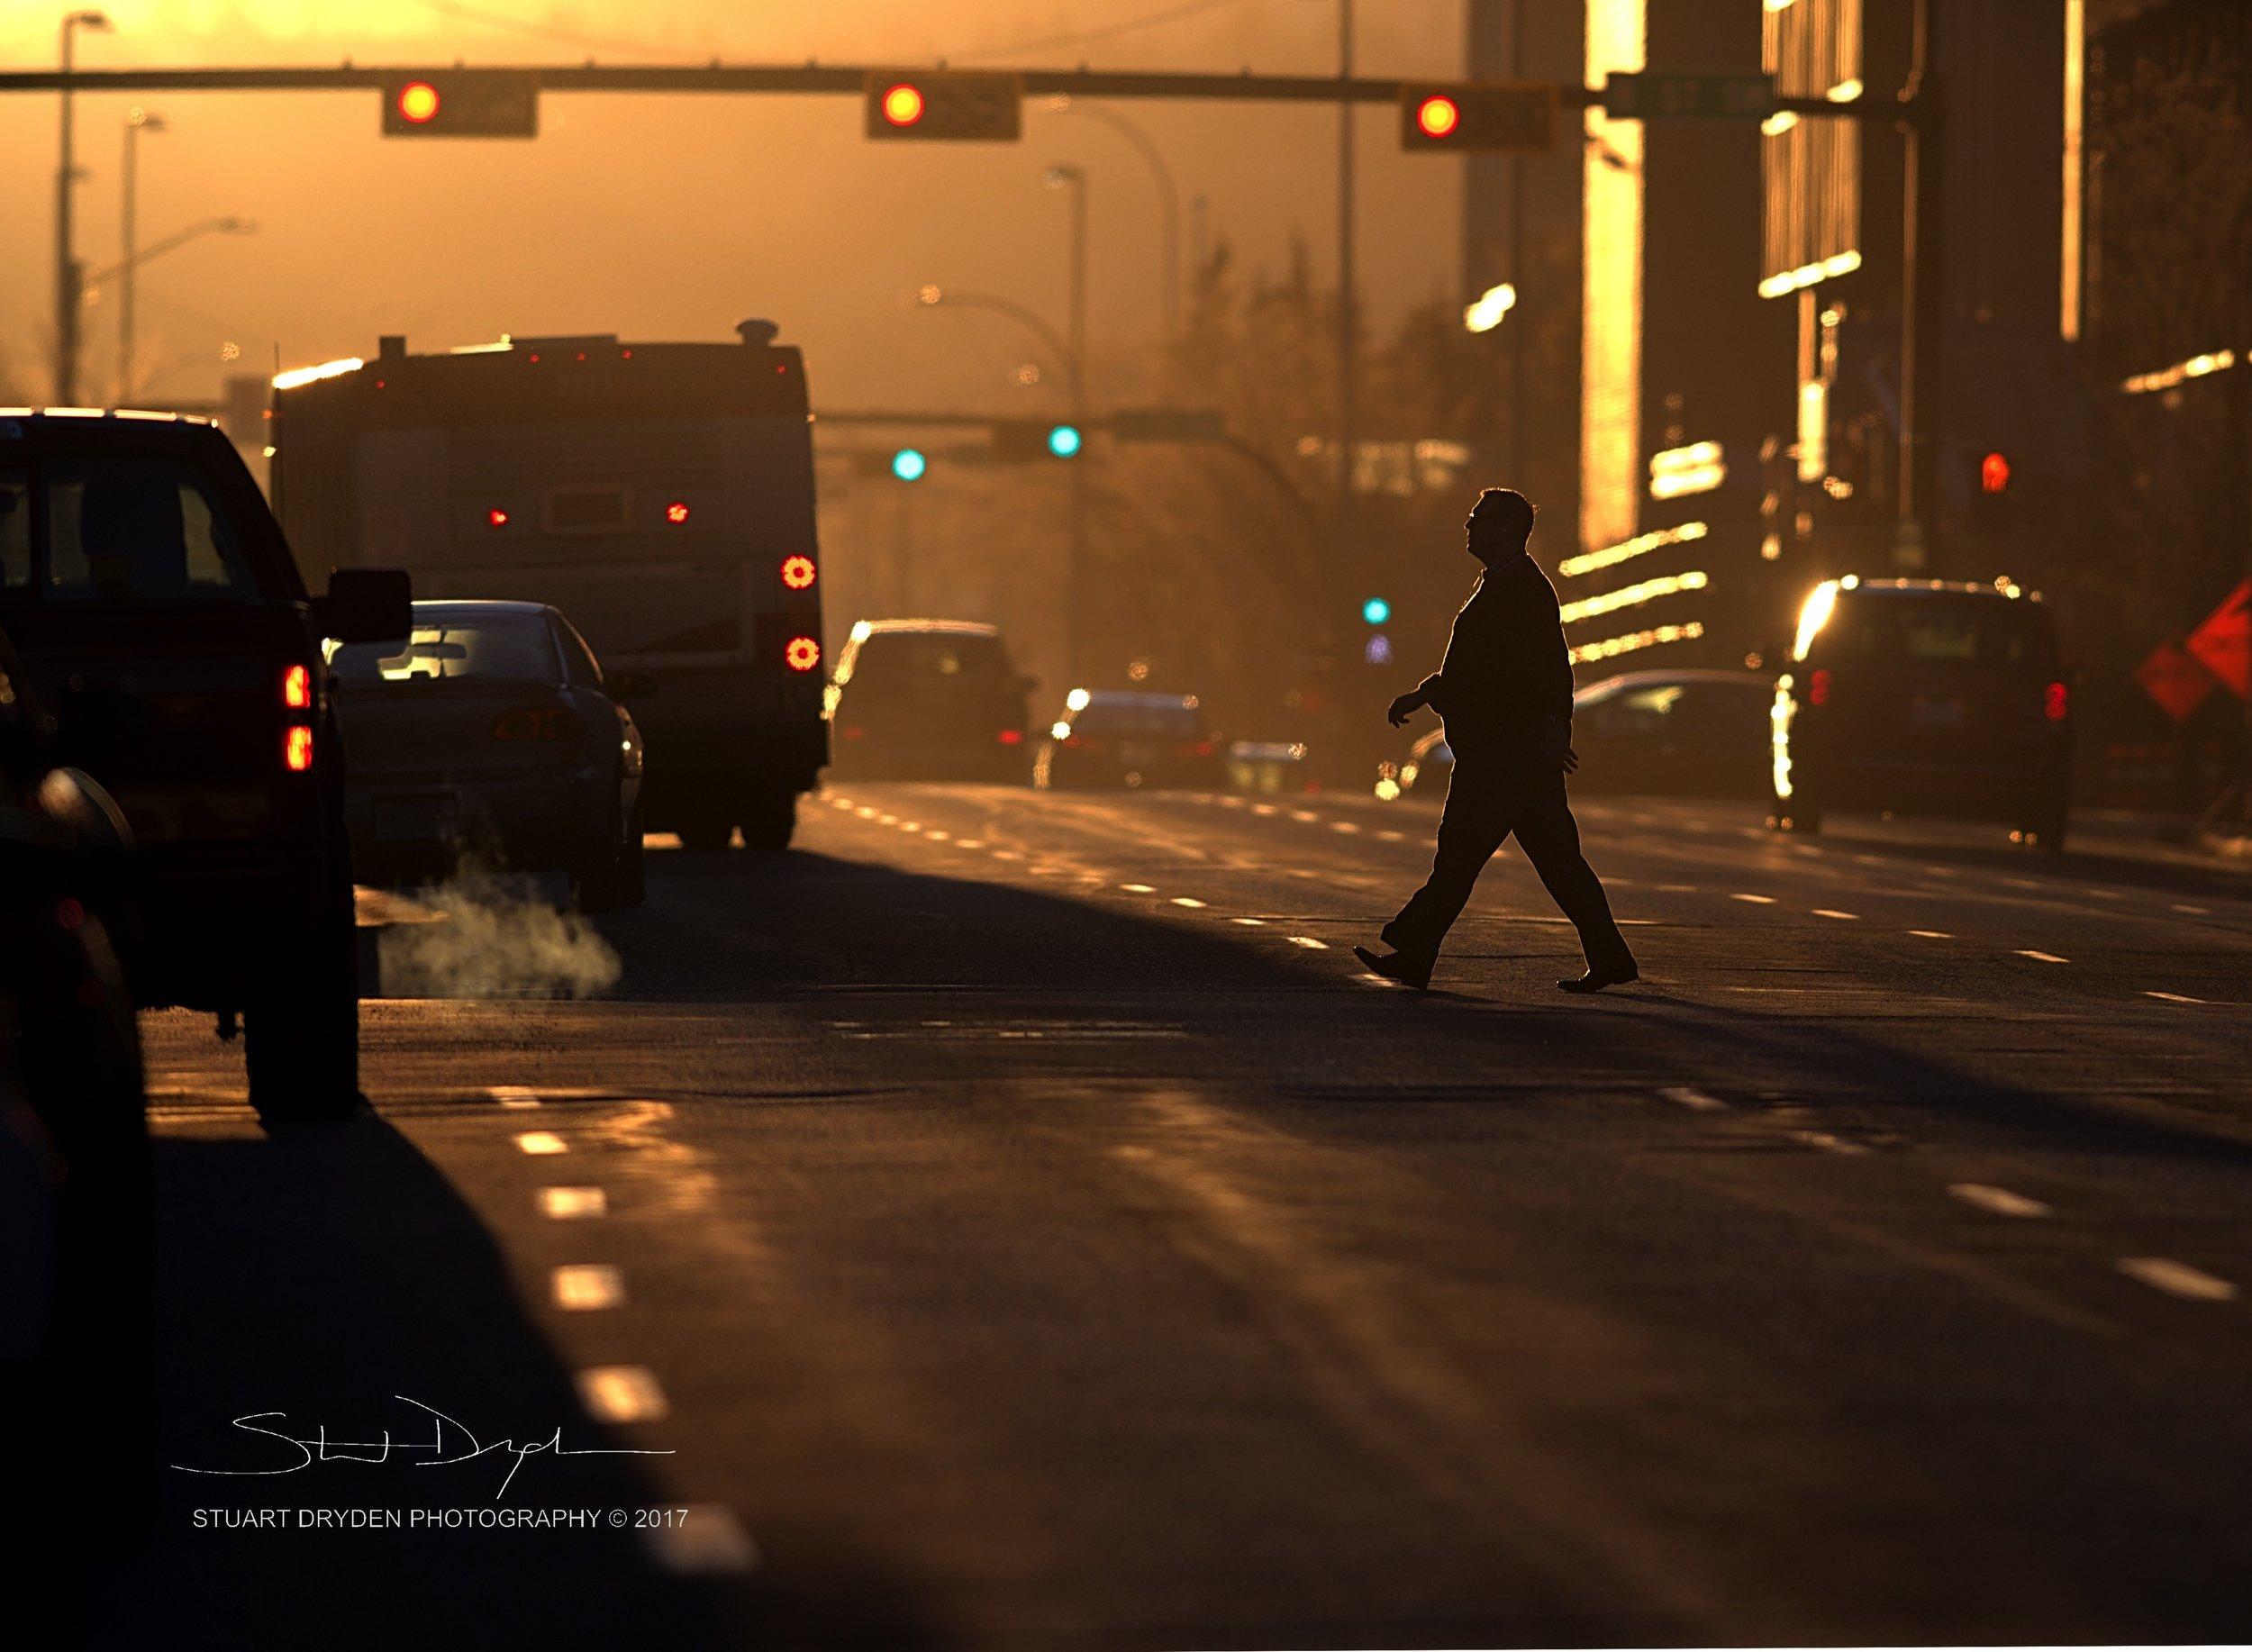 Pedestrian